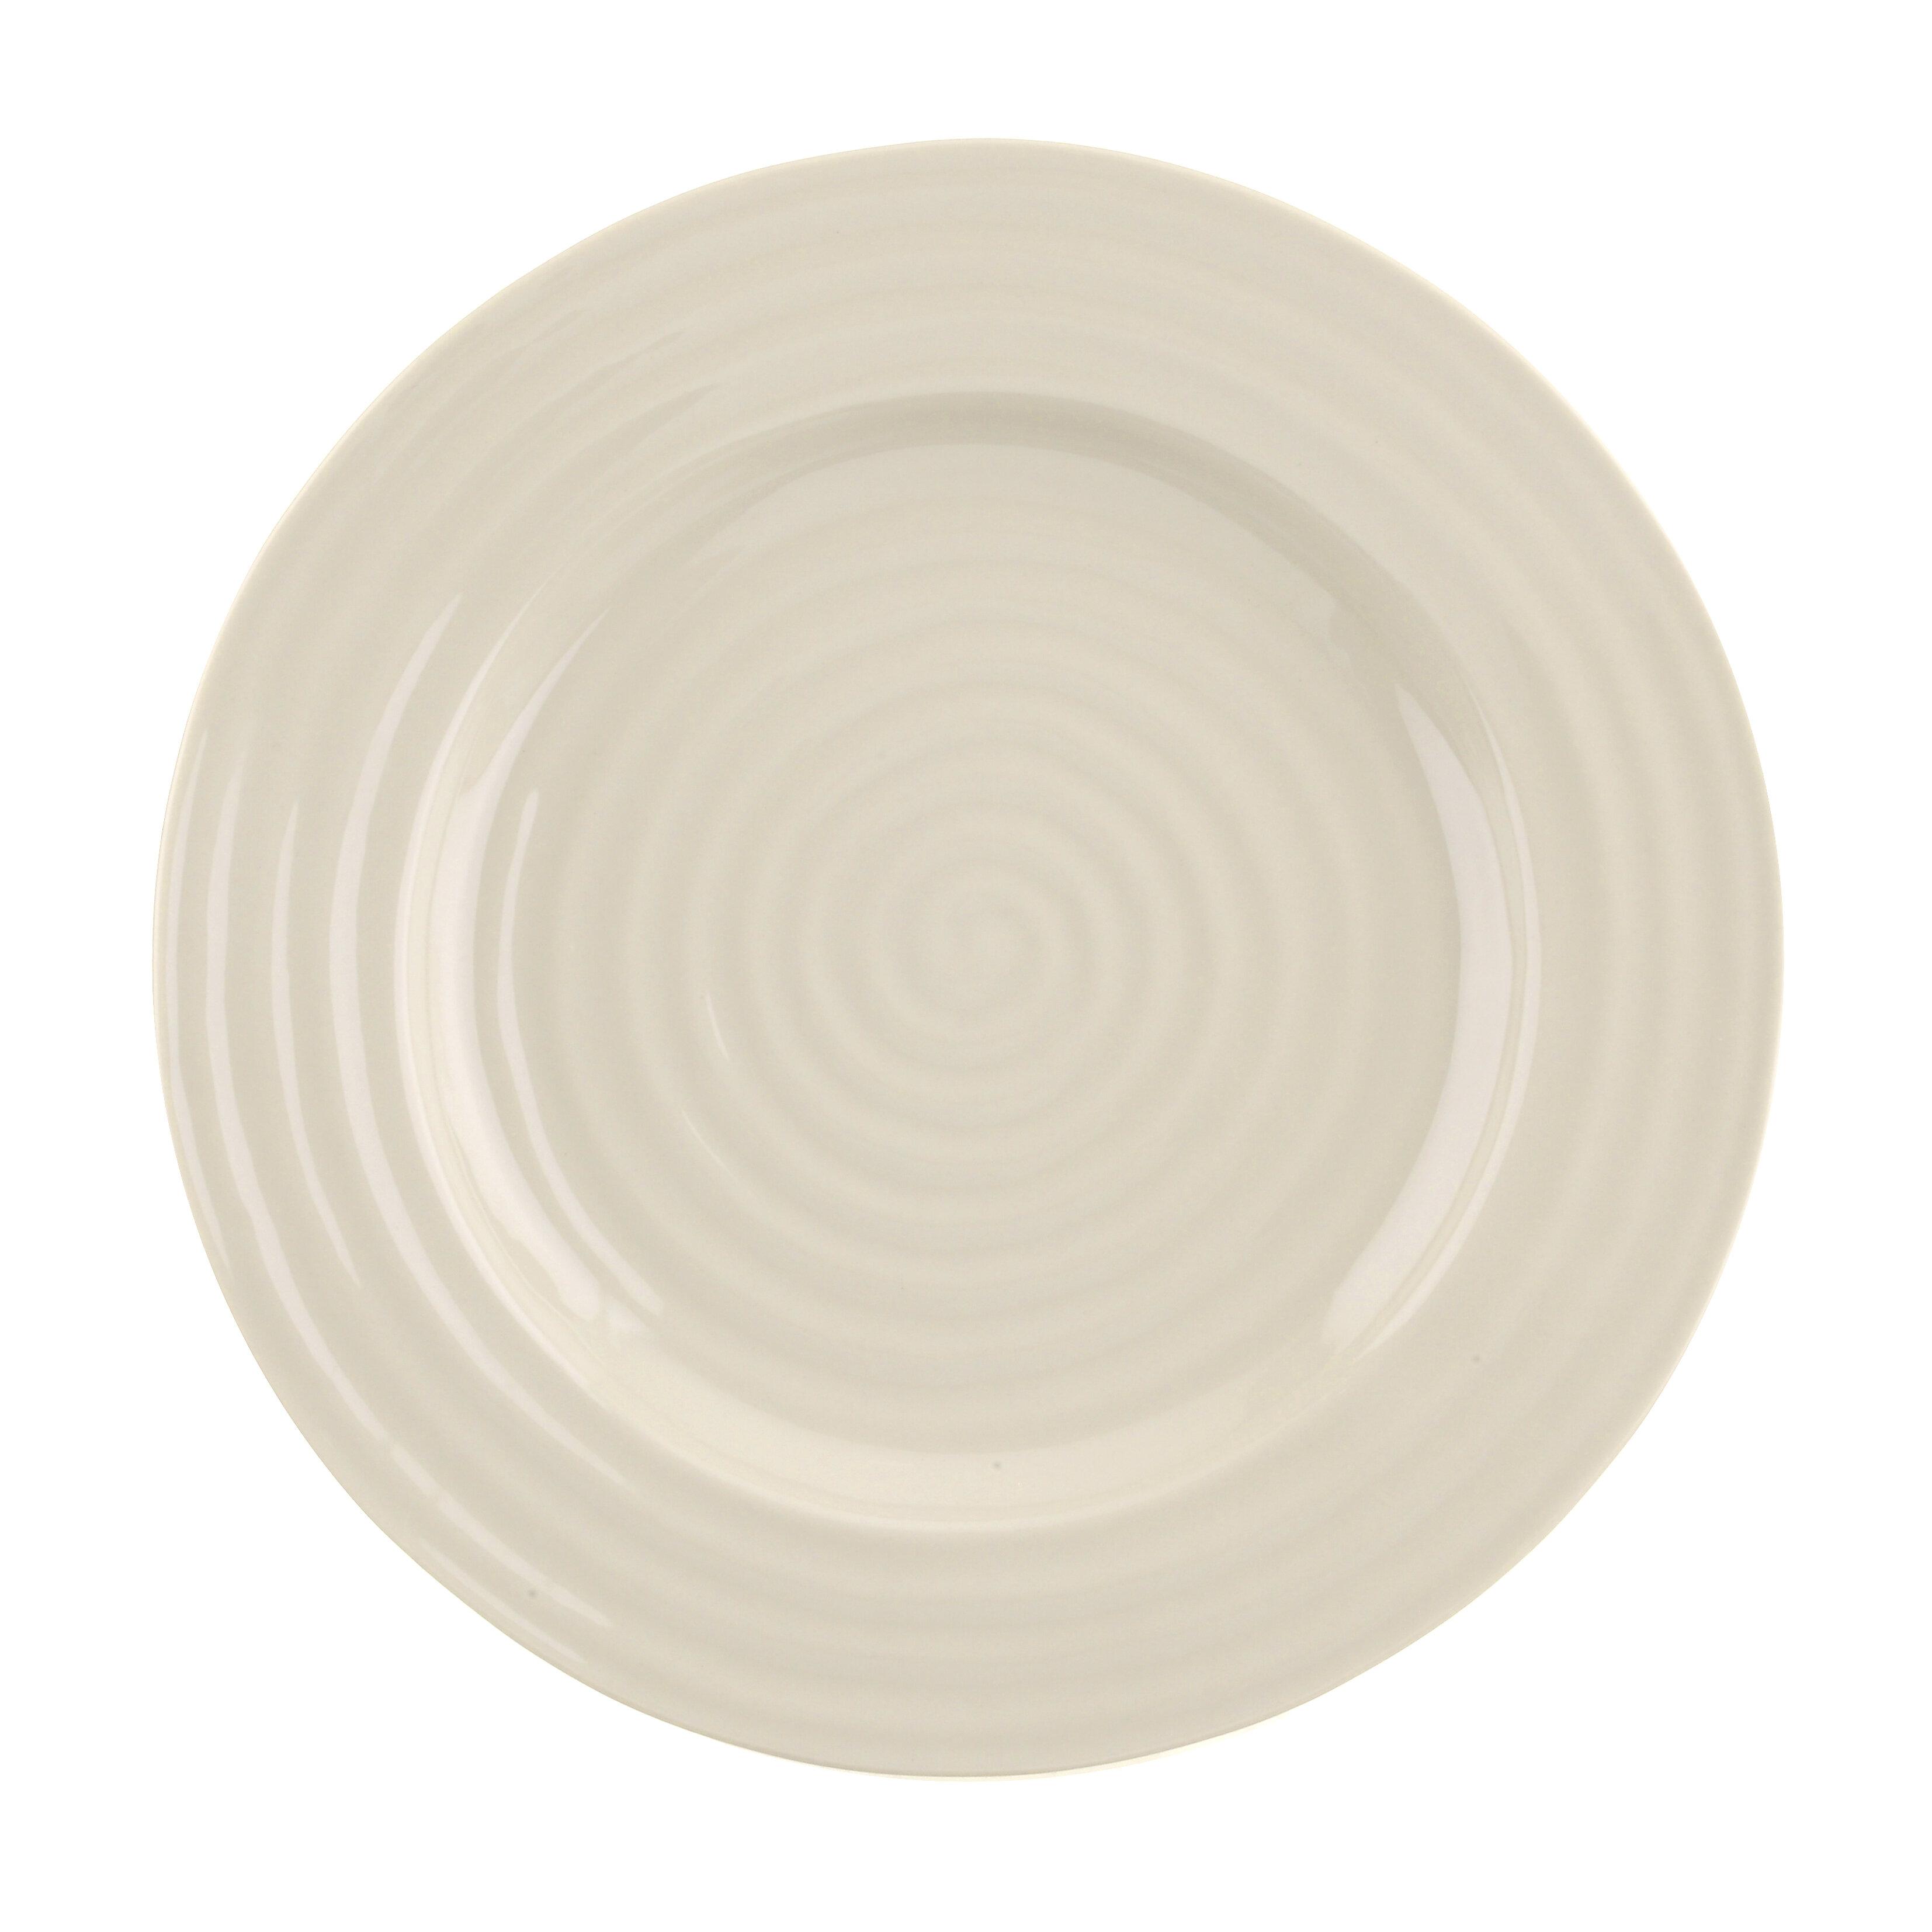 sc 1 st  Wayfair & Portmeirion Sophie Conran Luncheon Plates Set \u0026 Reviews | Wayfair